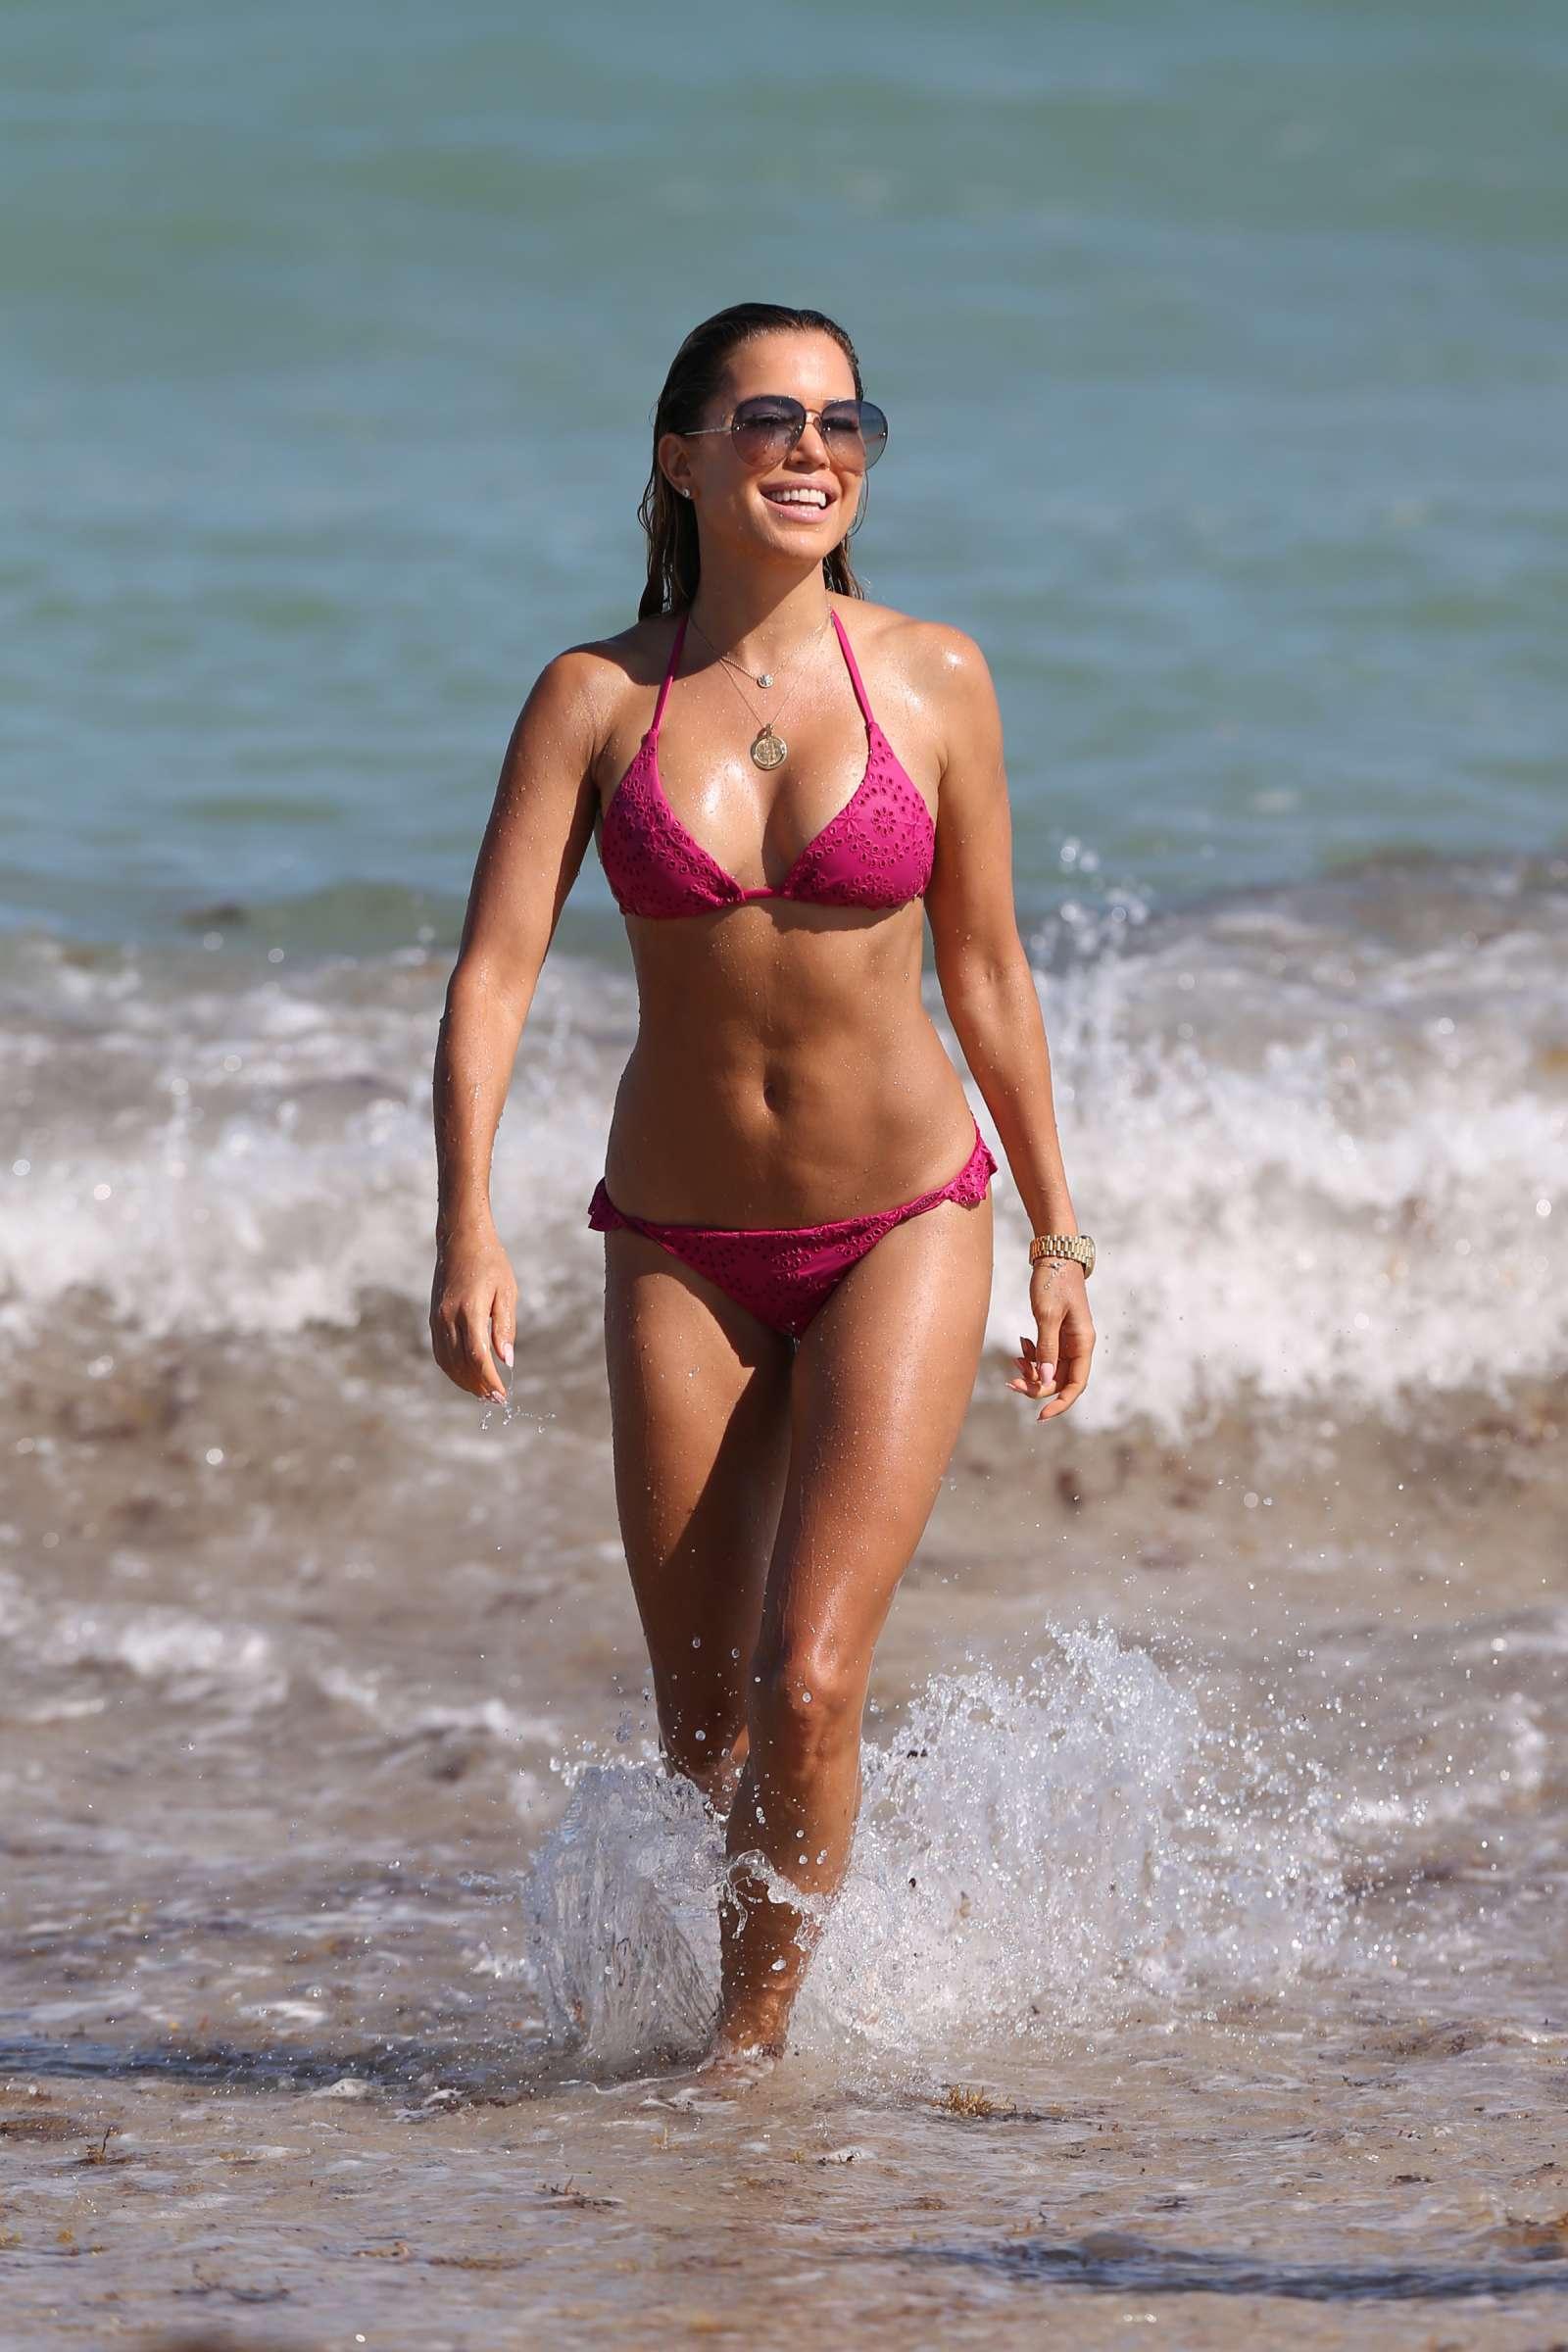 Sylvie Meis 2018 : Sylvie Meis in Pink Bikini 2018 -13